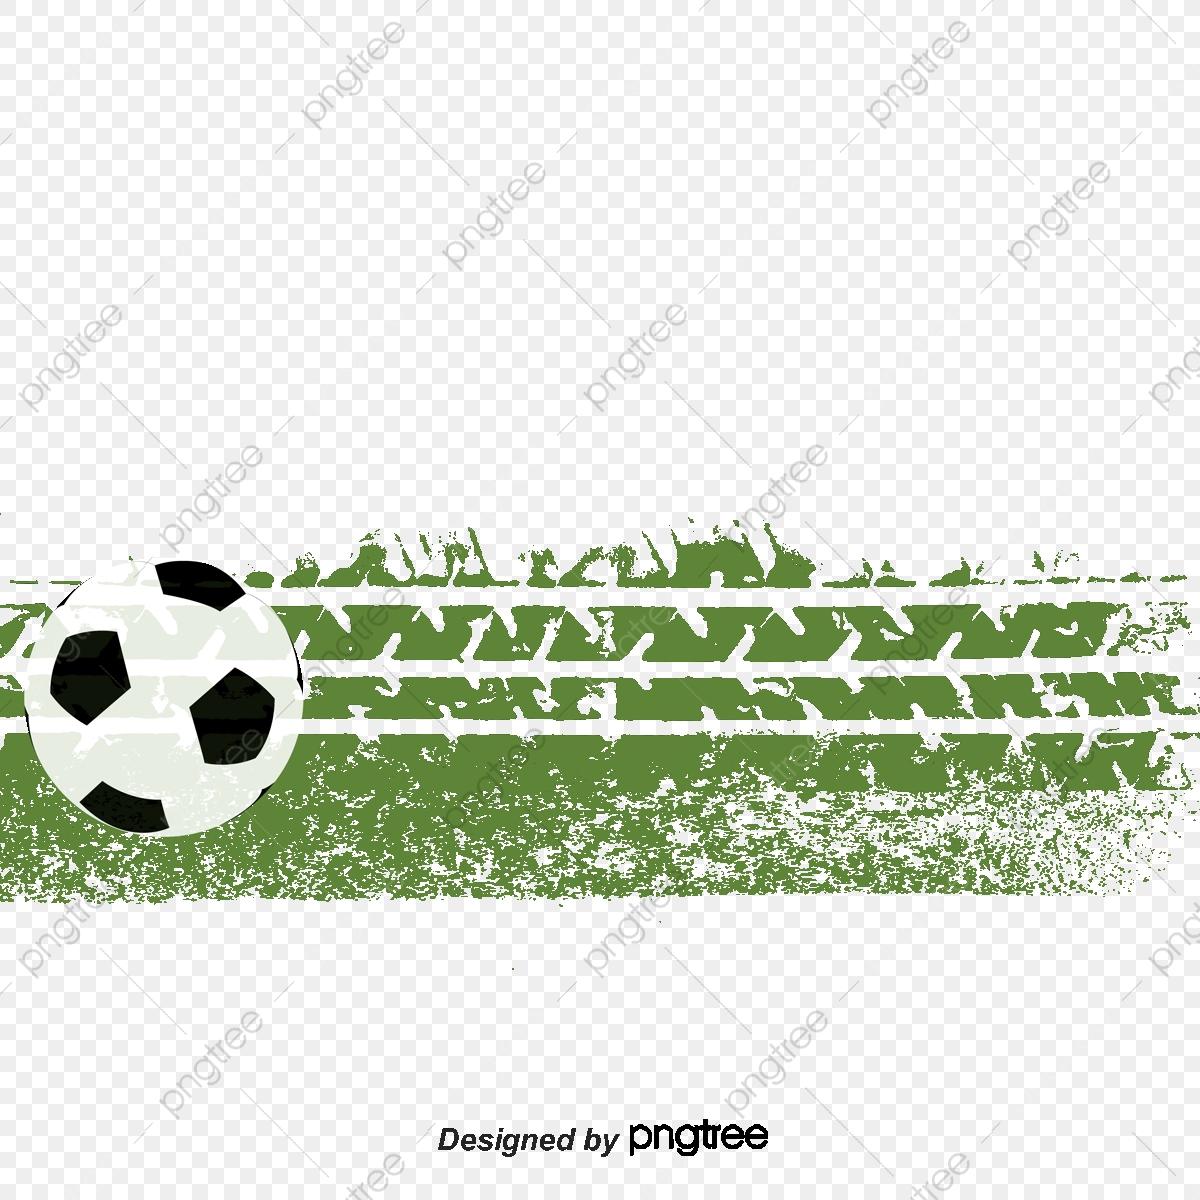 Football Banner Design Elements, Football Vector, Banner Vector.